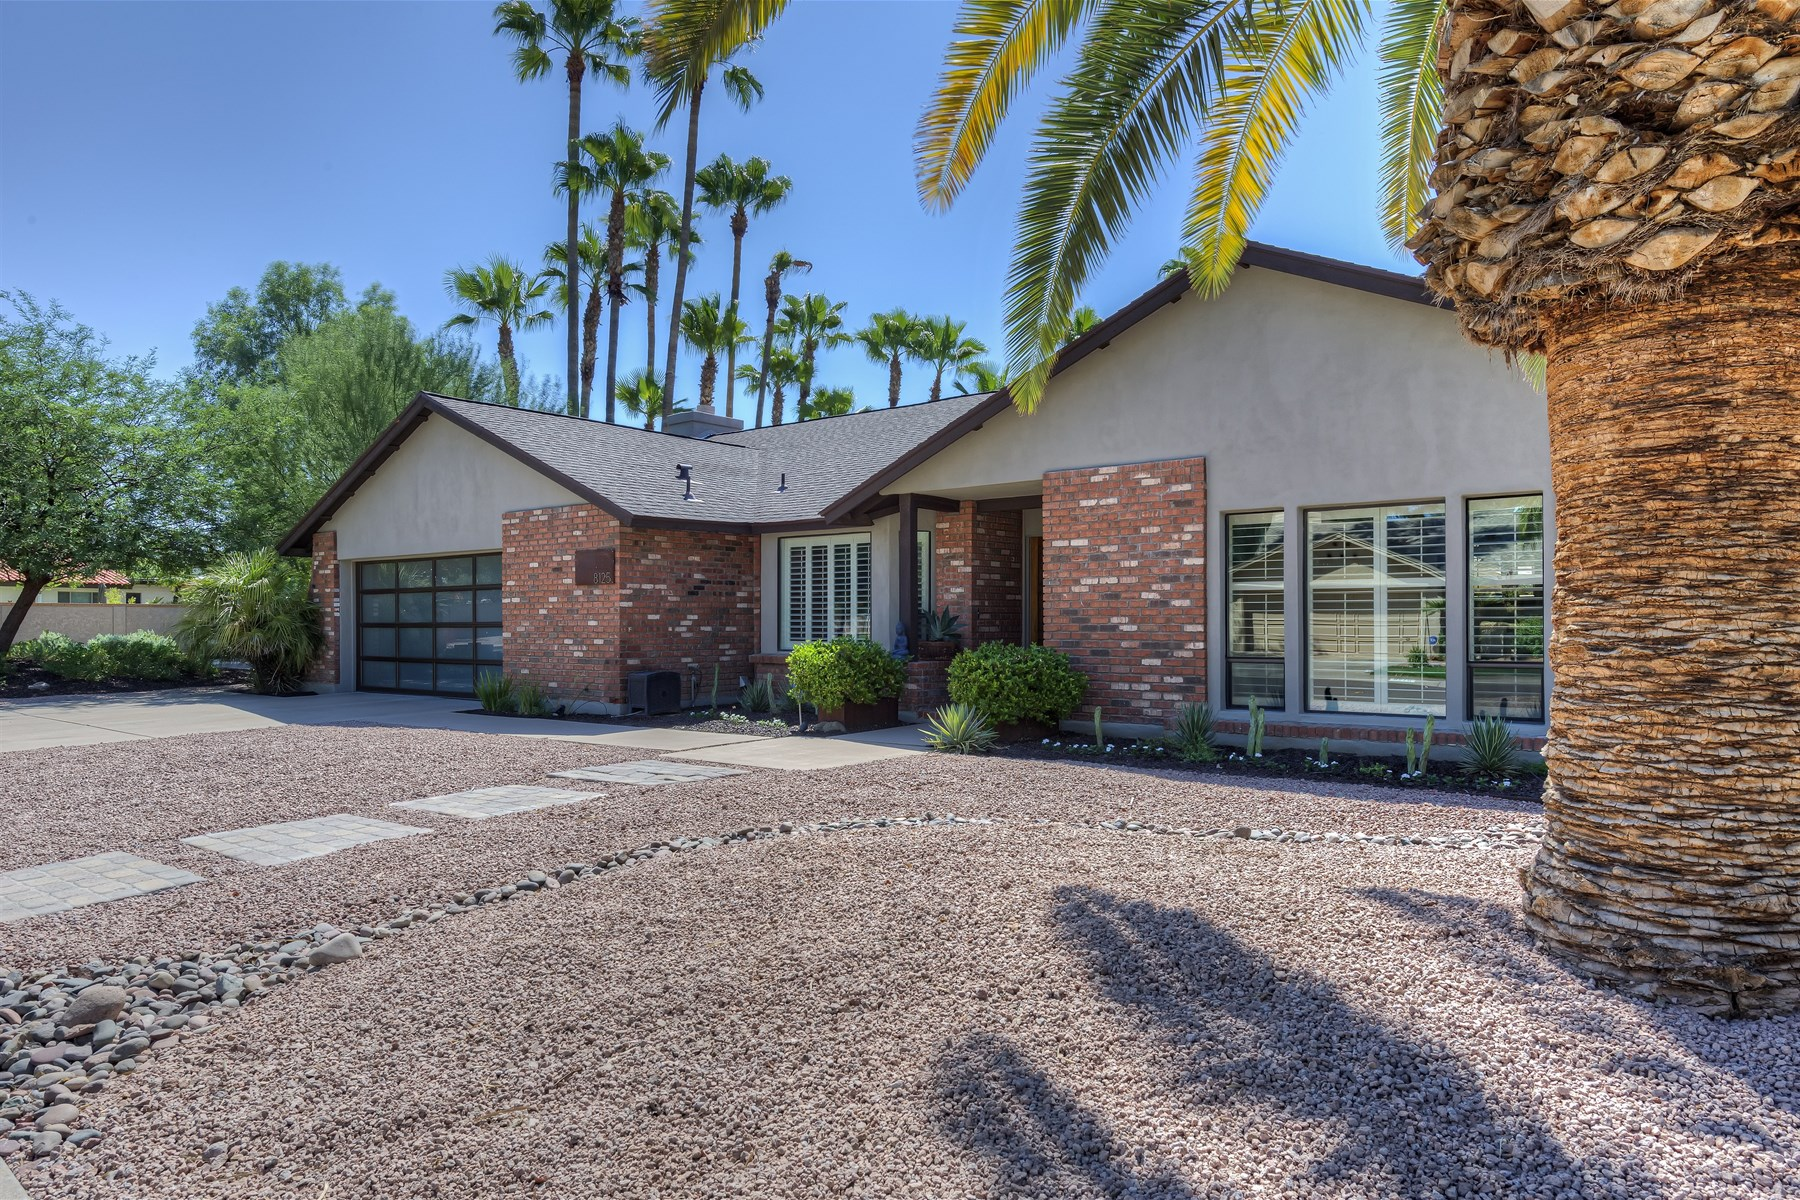 Casa Unifamiliar por un Venta en Located in the Arabian Trail Loop just steps from the greenbelt. 8125 E Ferzon Trl Scottsdale, Arizona 85258 Estados Unidos